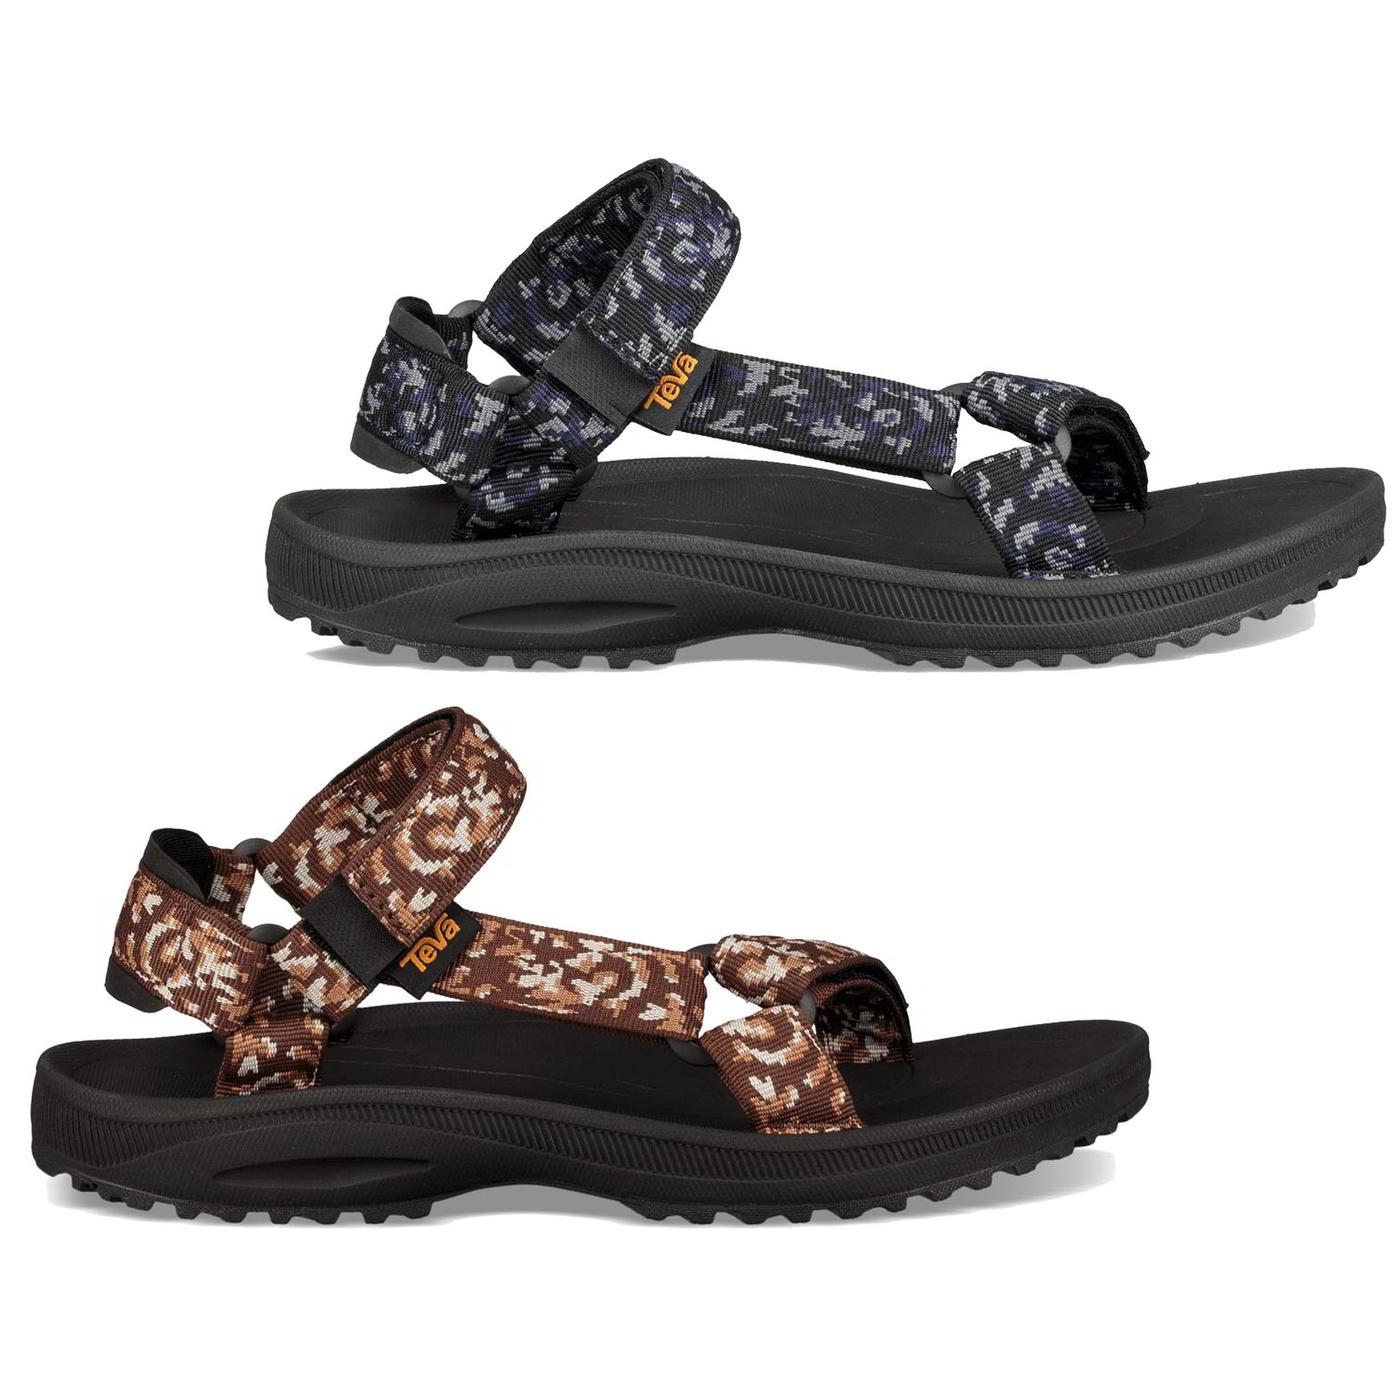 Teva Winsted Mens Grey Black Adjustable Walking Watersport Sandals Size UK 7-12